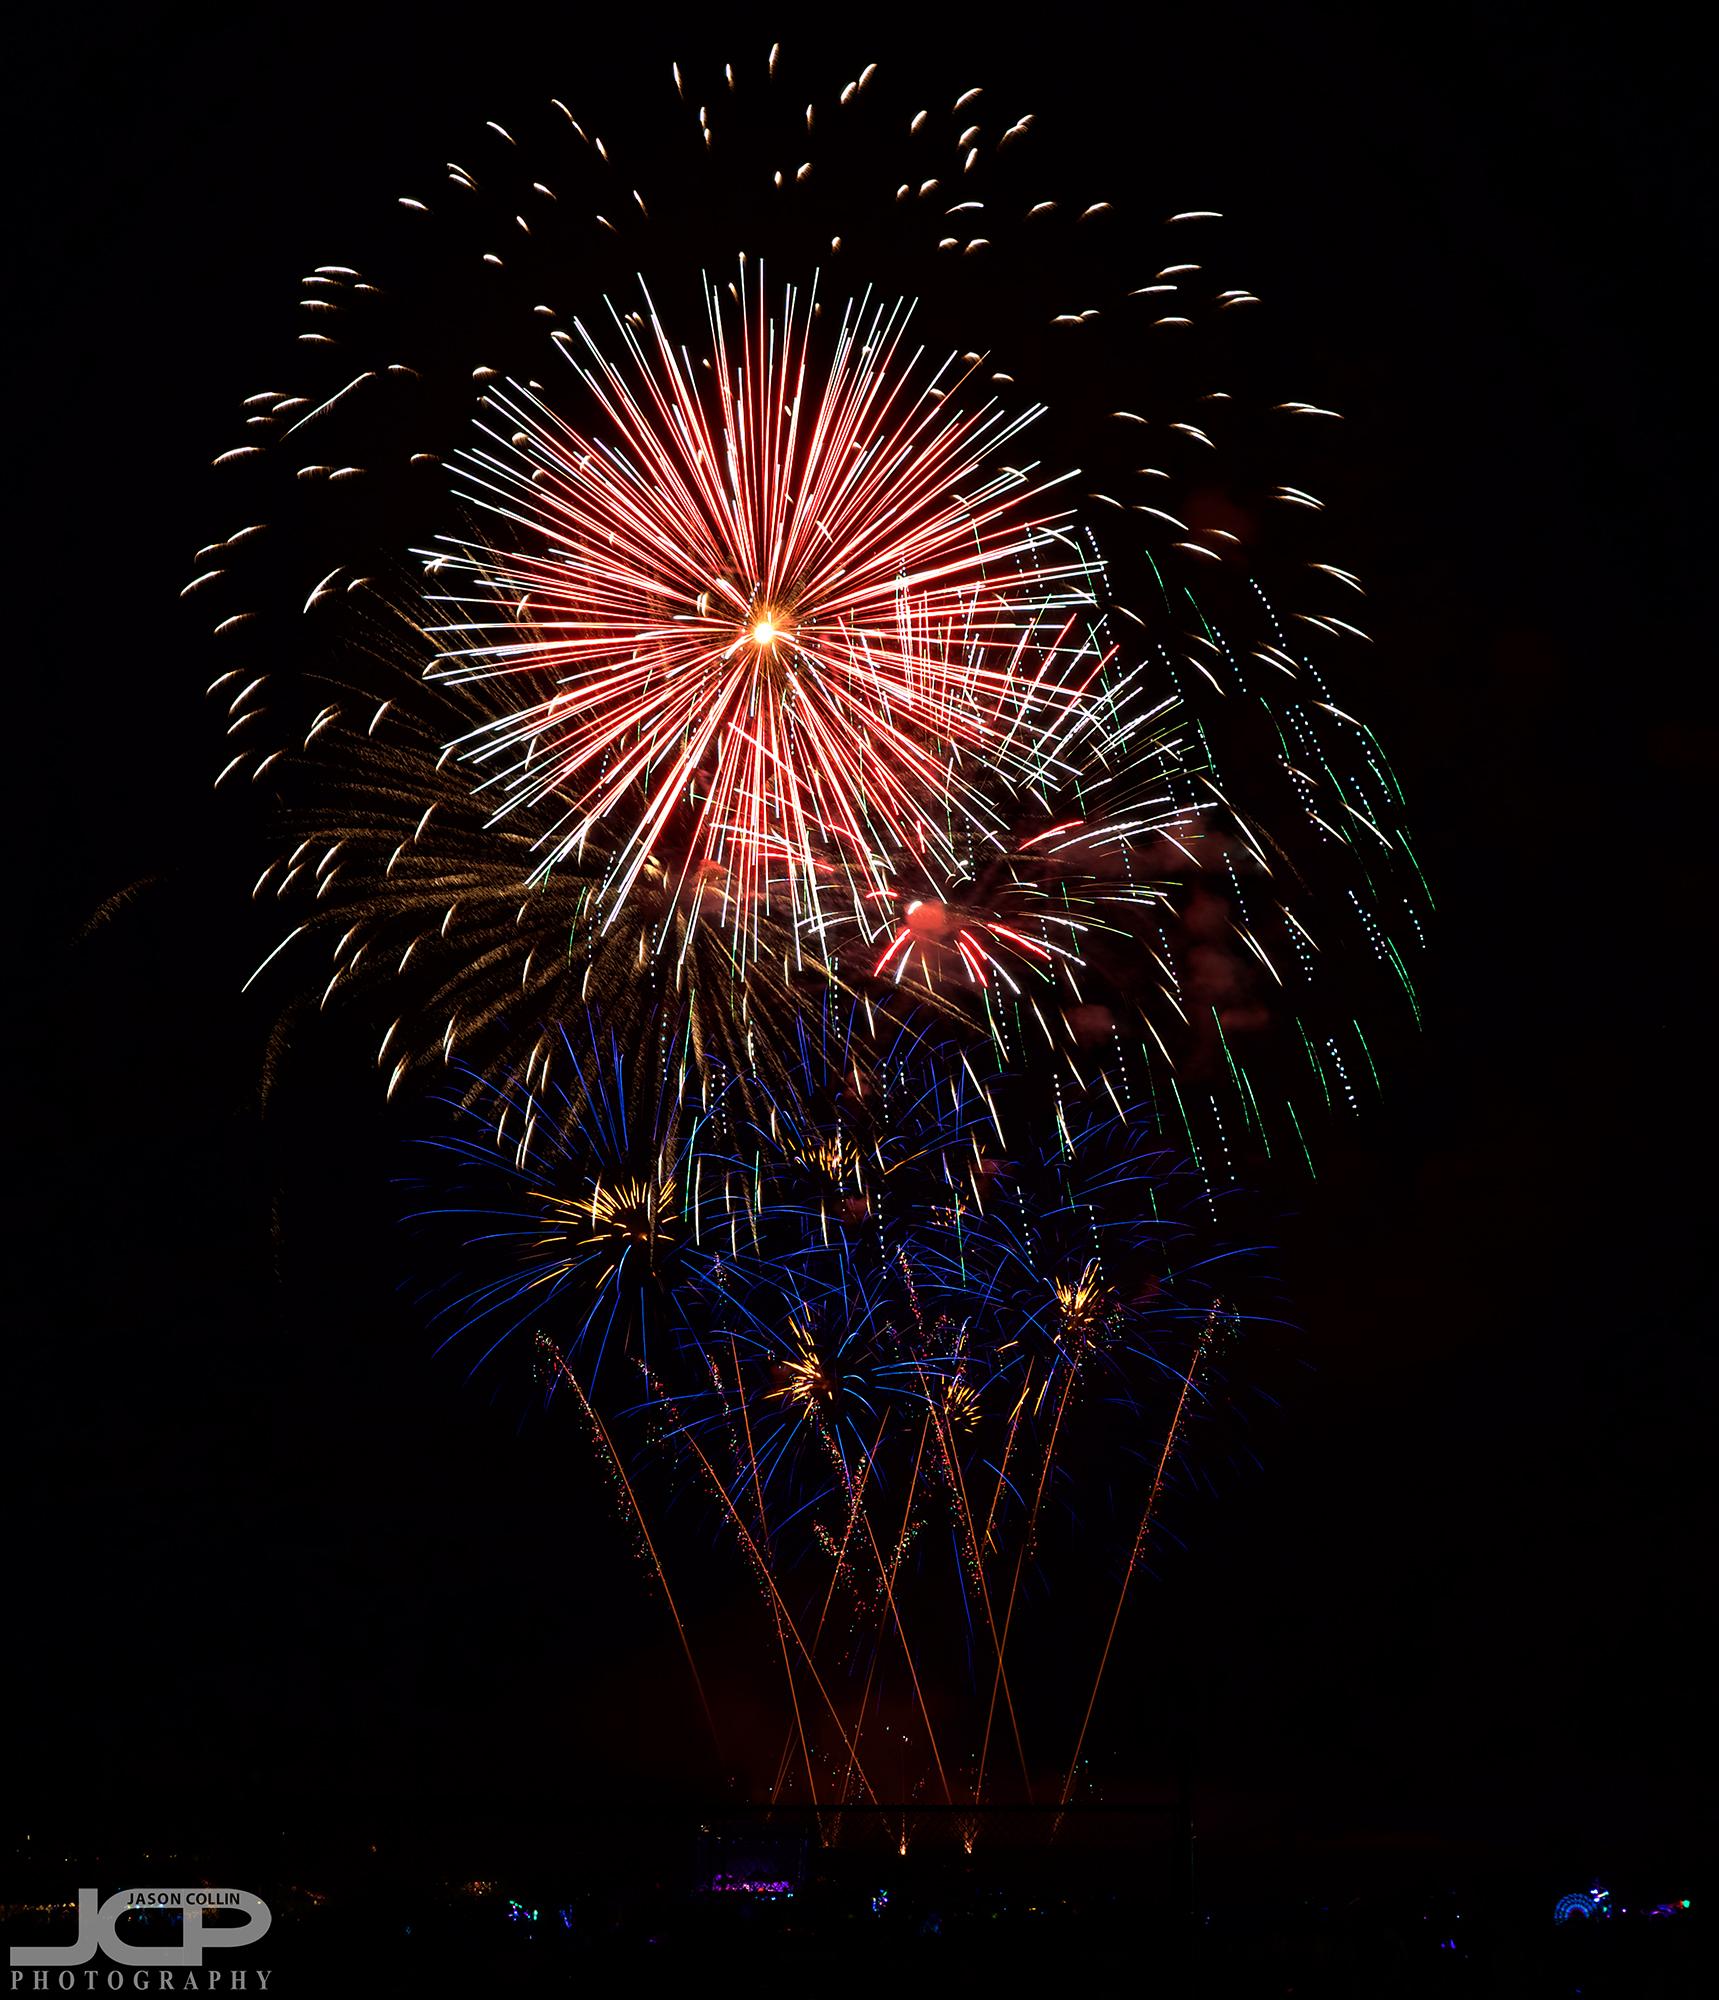 fireworks-7-04-2019-abq-131741.jpg